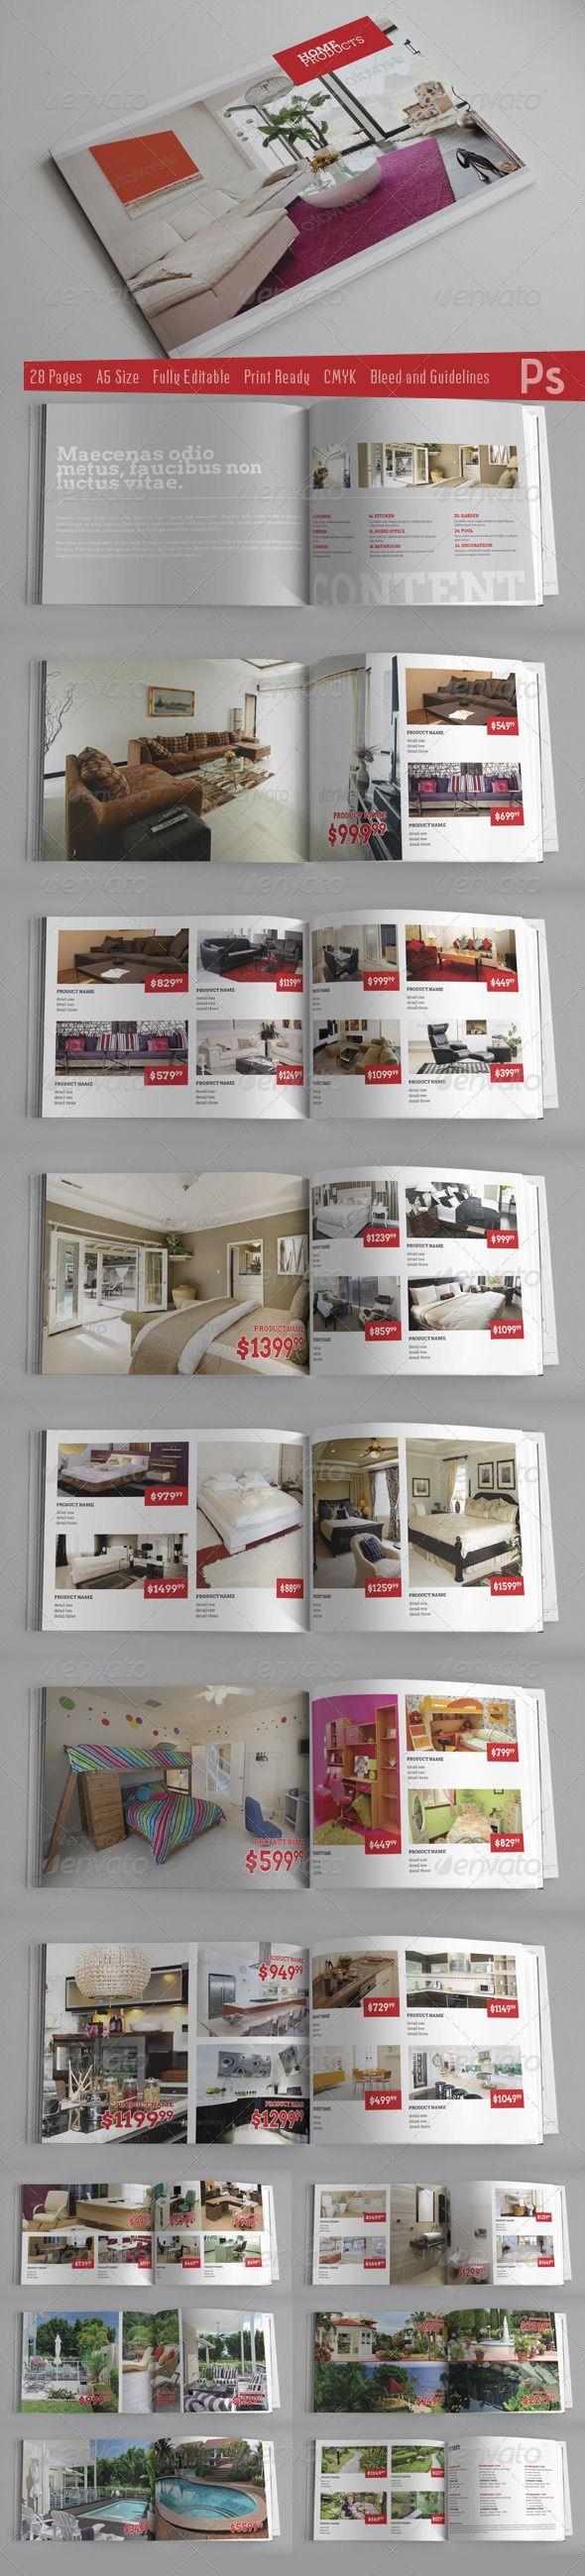 15 best design - catalog layouts images on Pinterest | Brochure ...